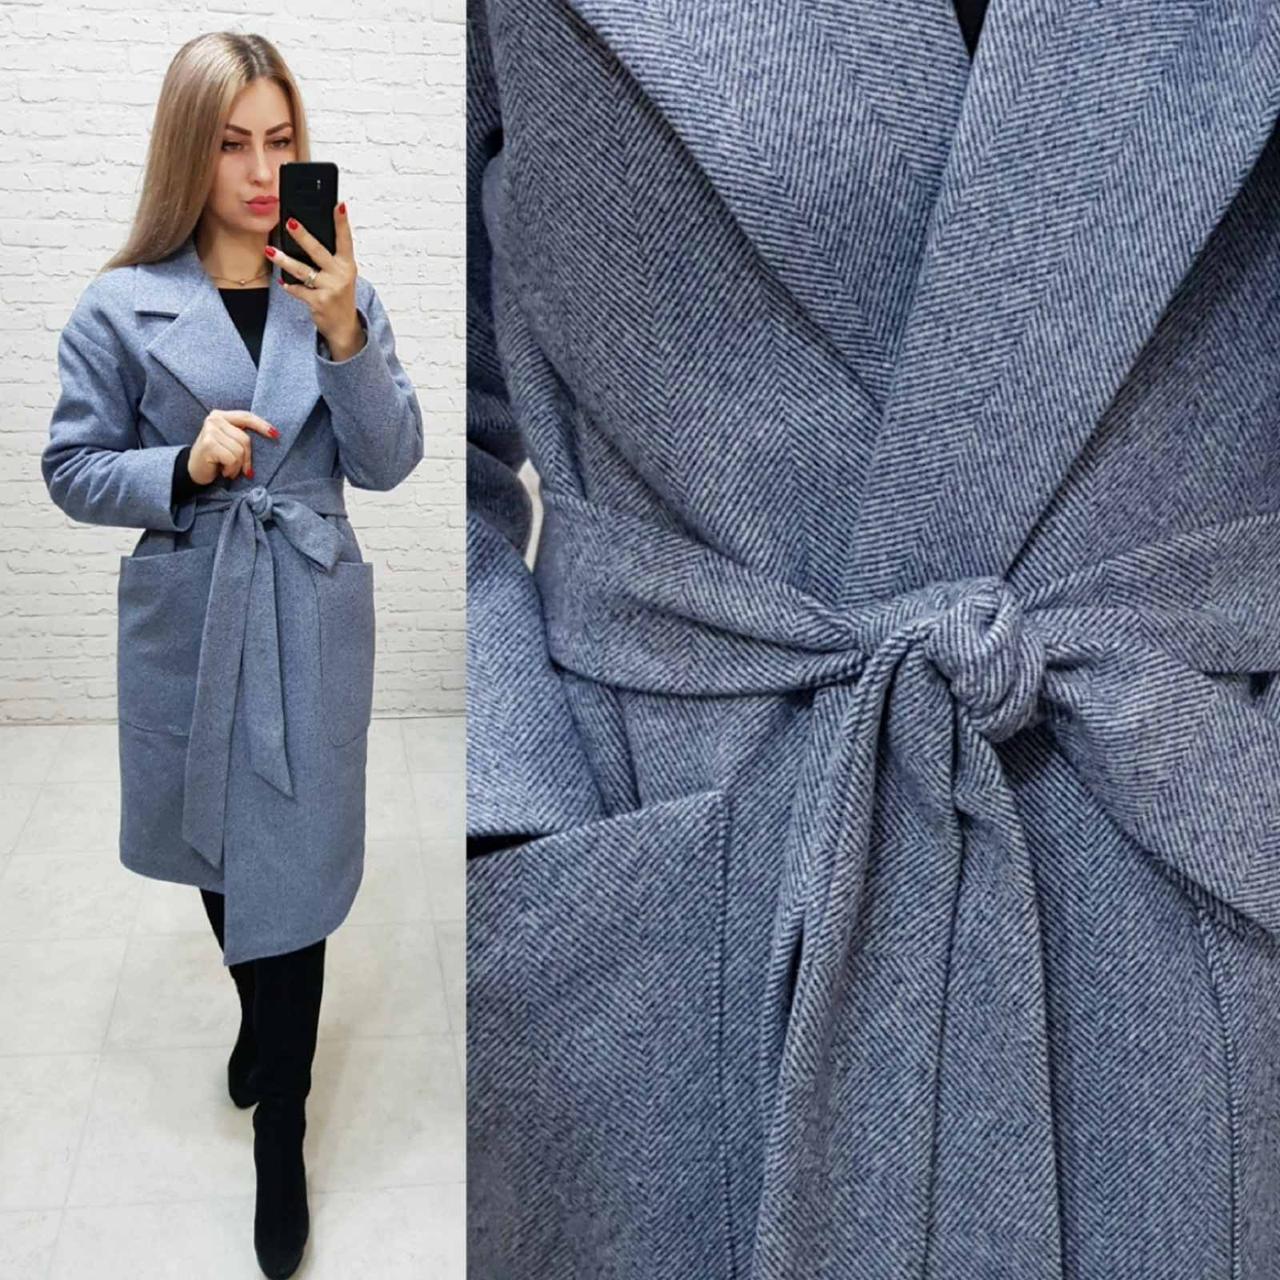 Кашемірове пальто утеплене на запах з кишенями,арт 175, колір джинс світлий (1)